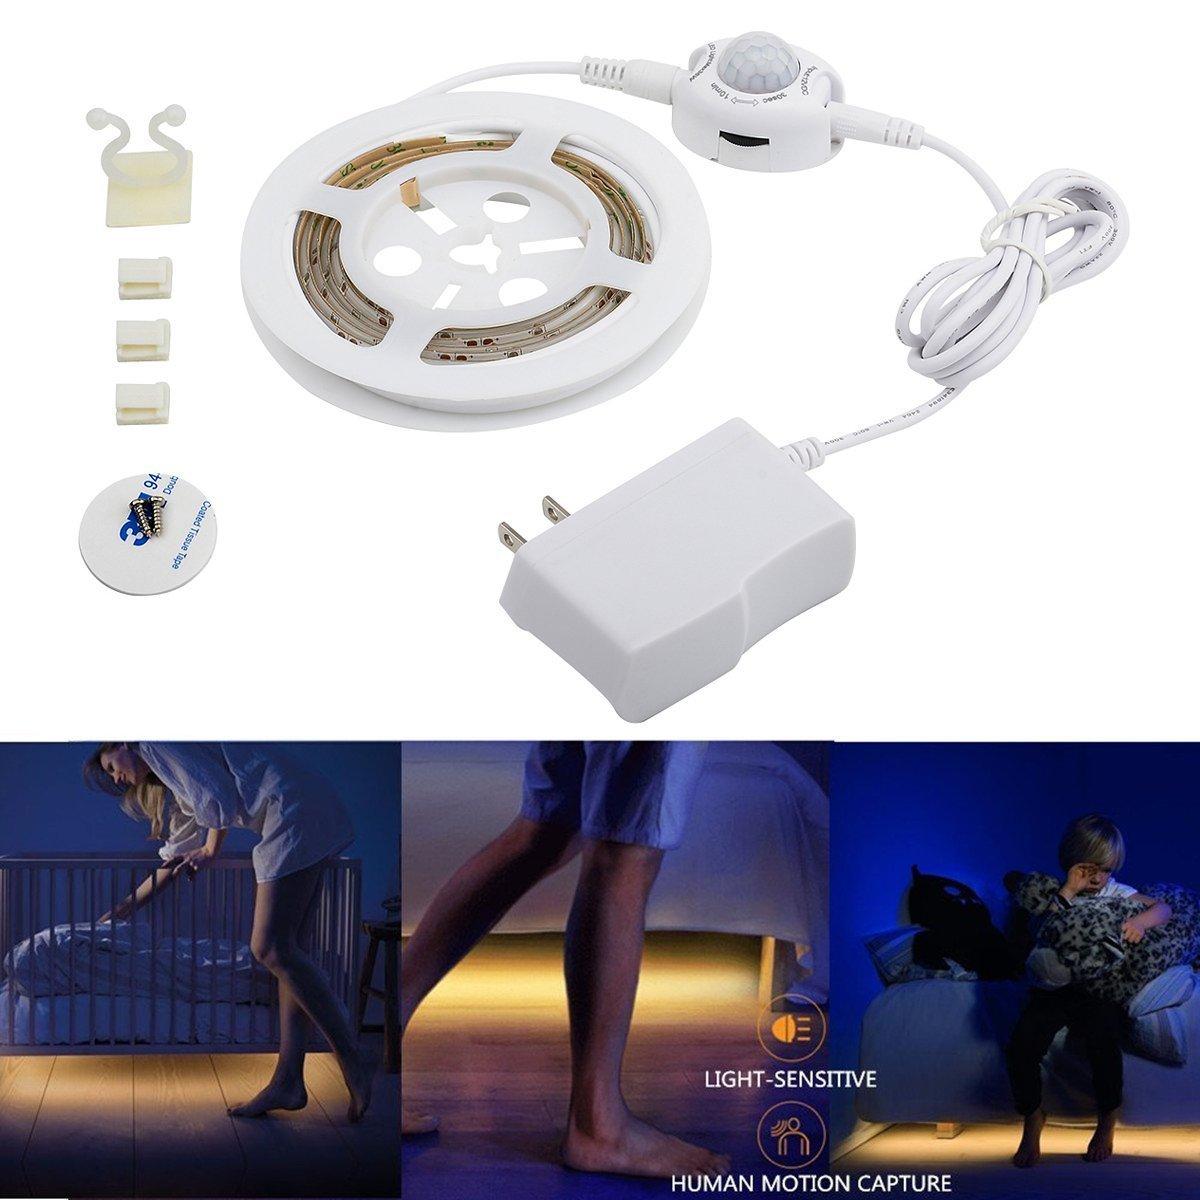 tdrforce 30seconds-6minutesモーションセンサーベッドライト、柔軟なLEDストリップ Single-bed light ホワイト TDR-B-66 B06X8YWV1J  Single-bed light